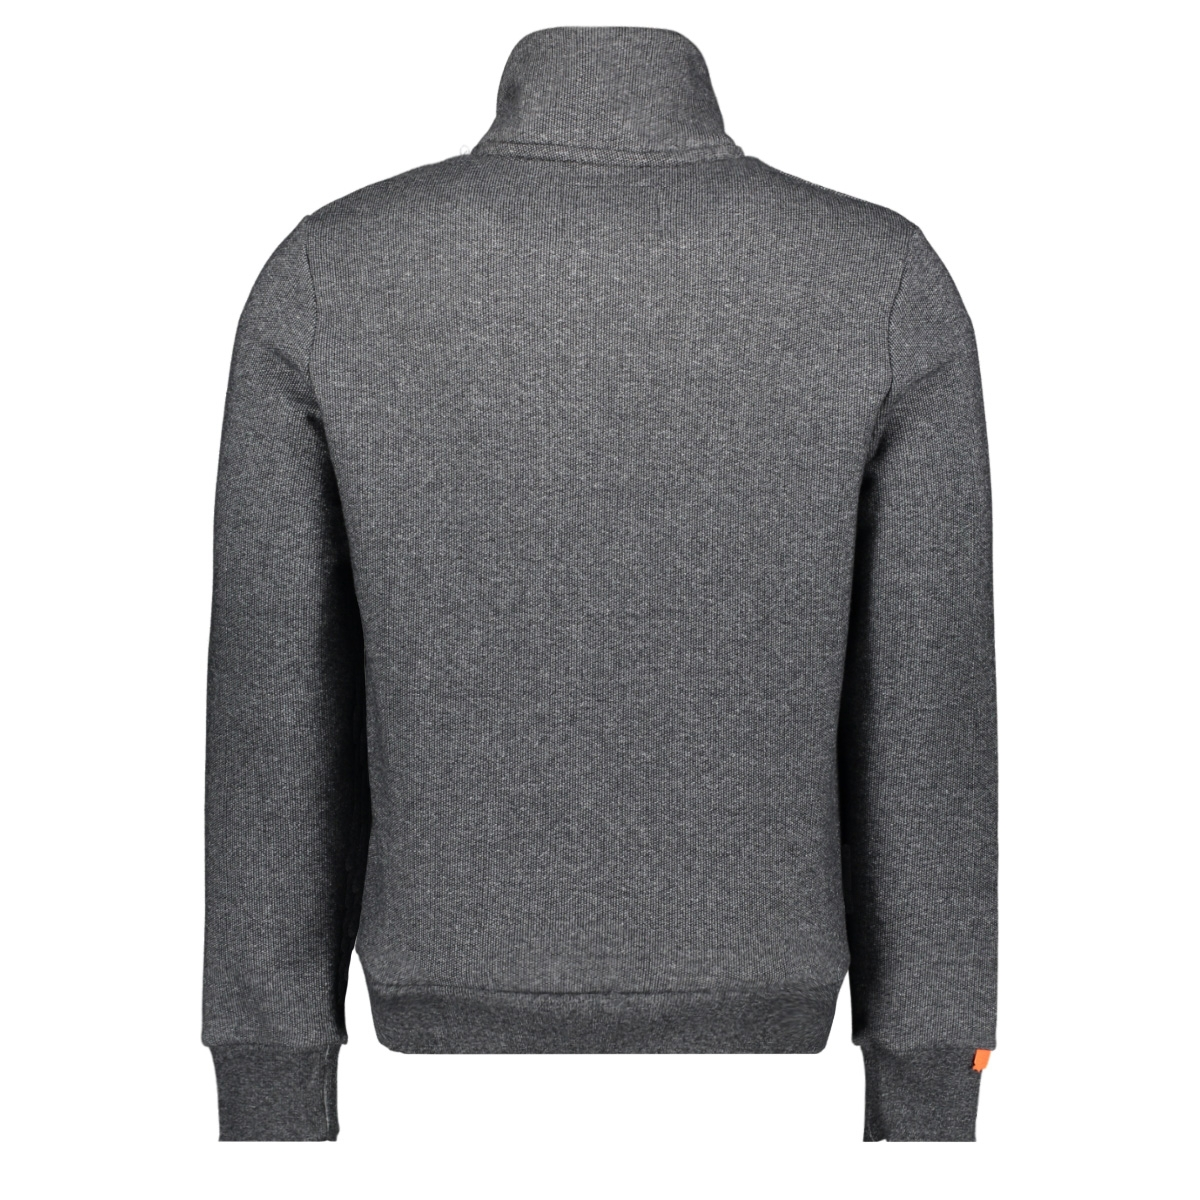 orange label classic track top m2010041a superdry vest mid grey texture